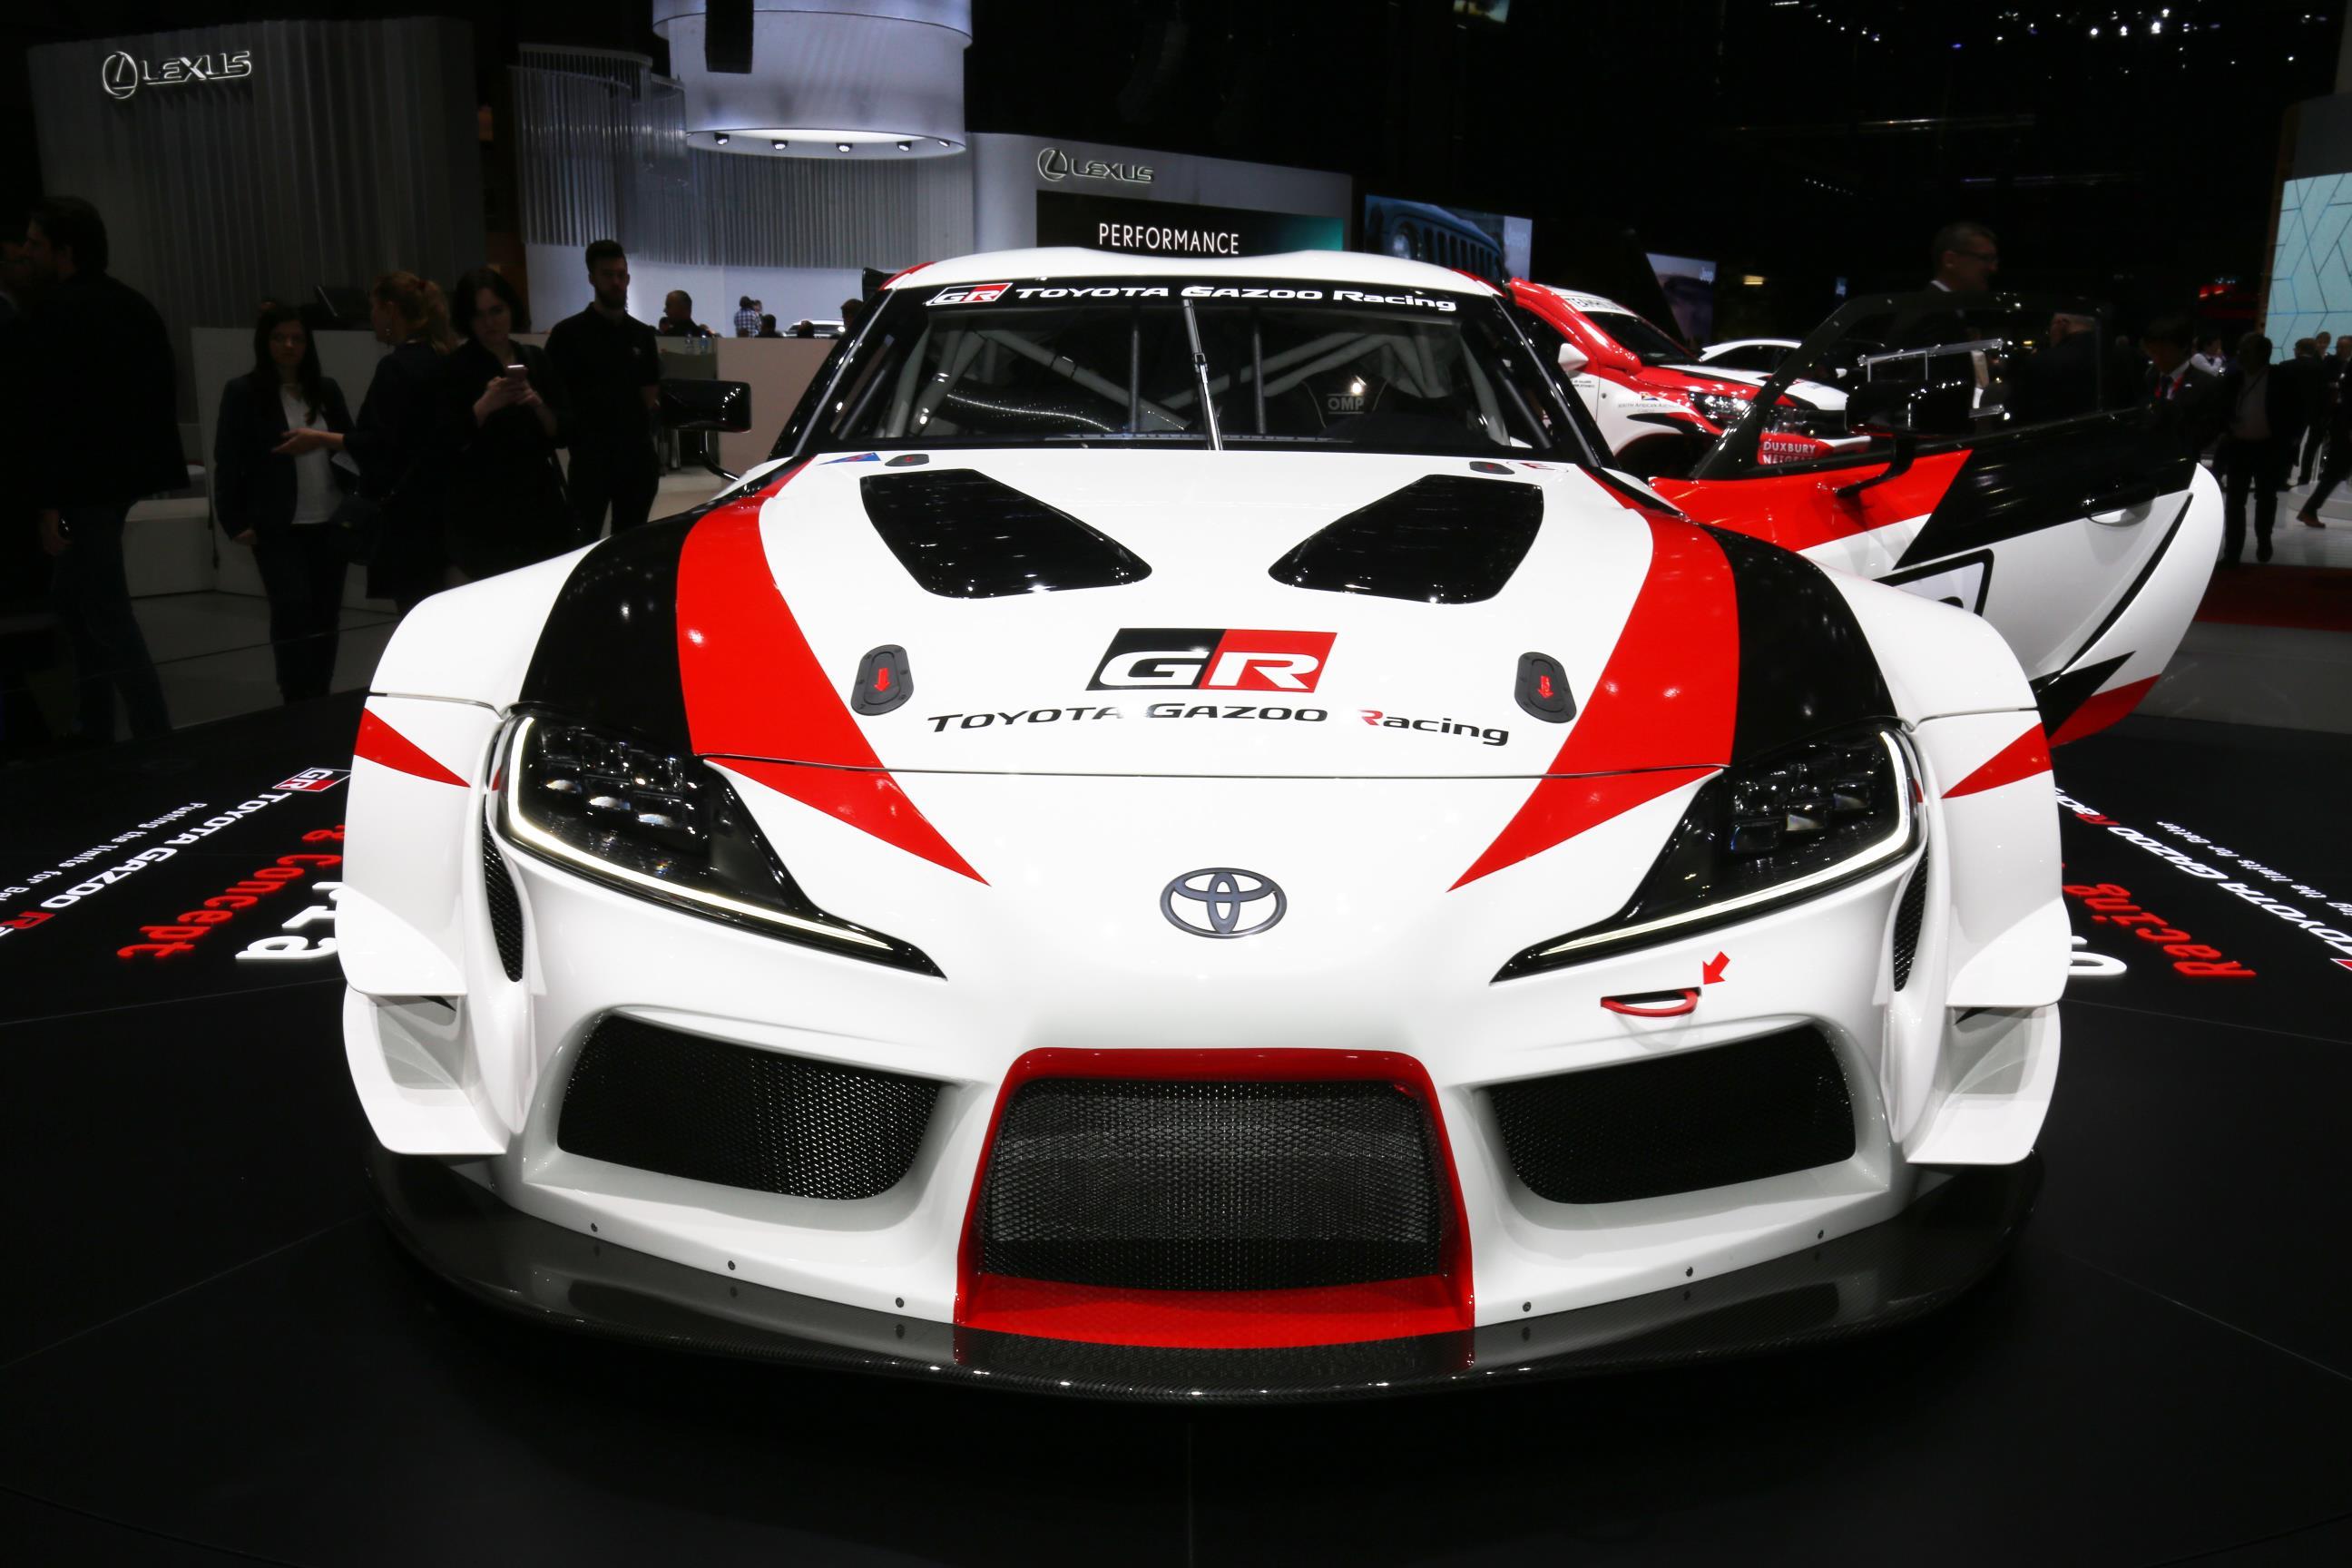 Geneva Motor Show 2018 Mega Gallery Part 1 (323)